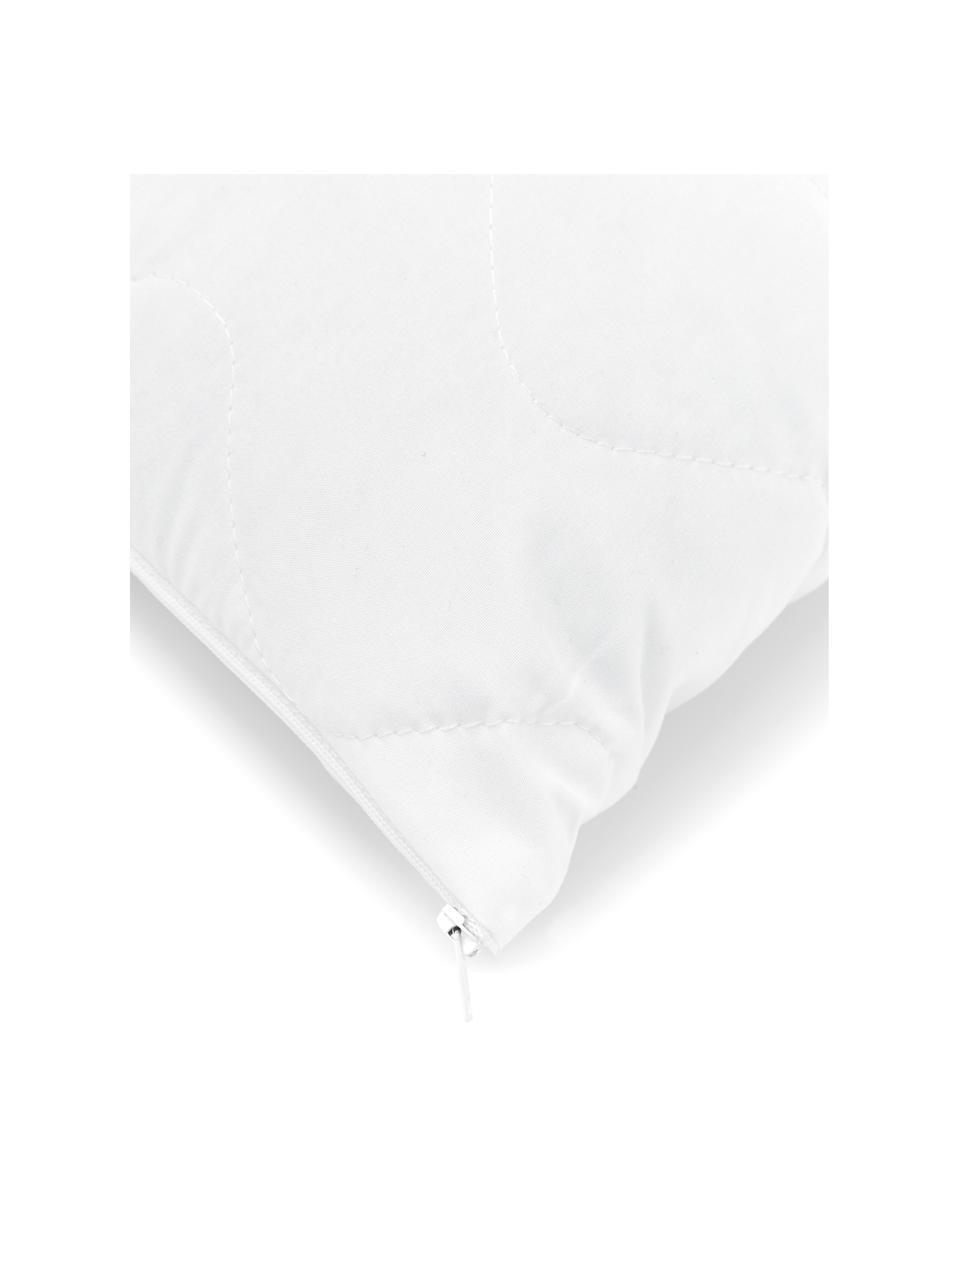 Premium kussenvulling Sia, 50x50, microvezel vulling, Wit, 50 x 50 cm